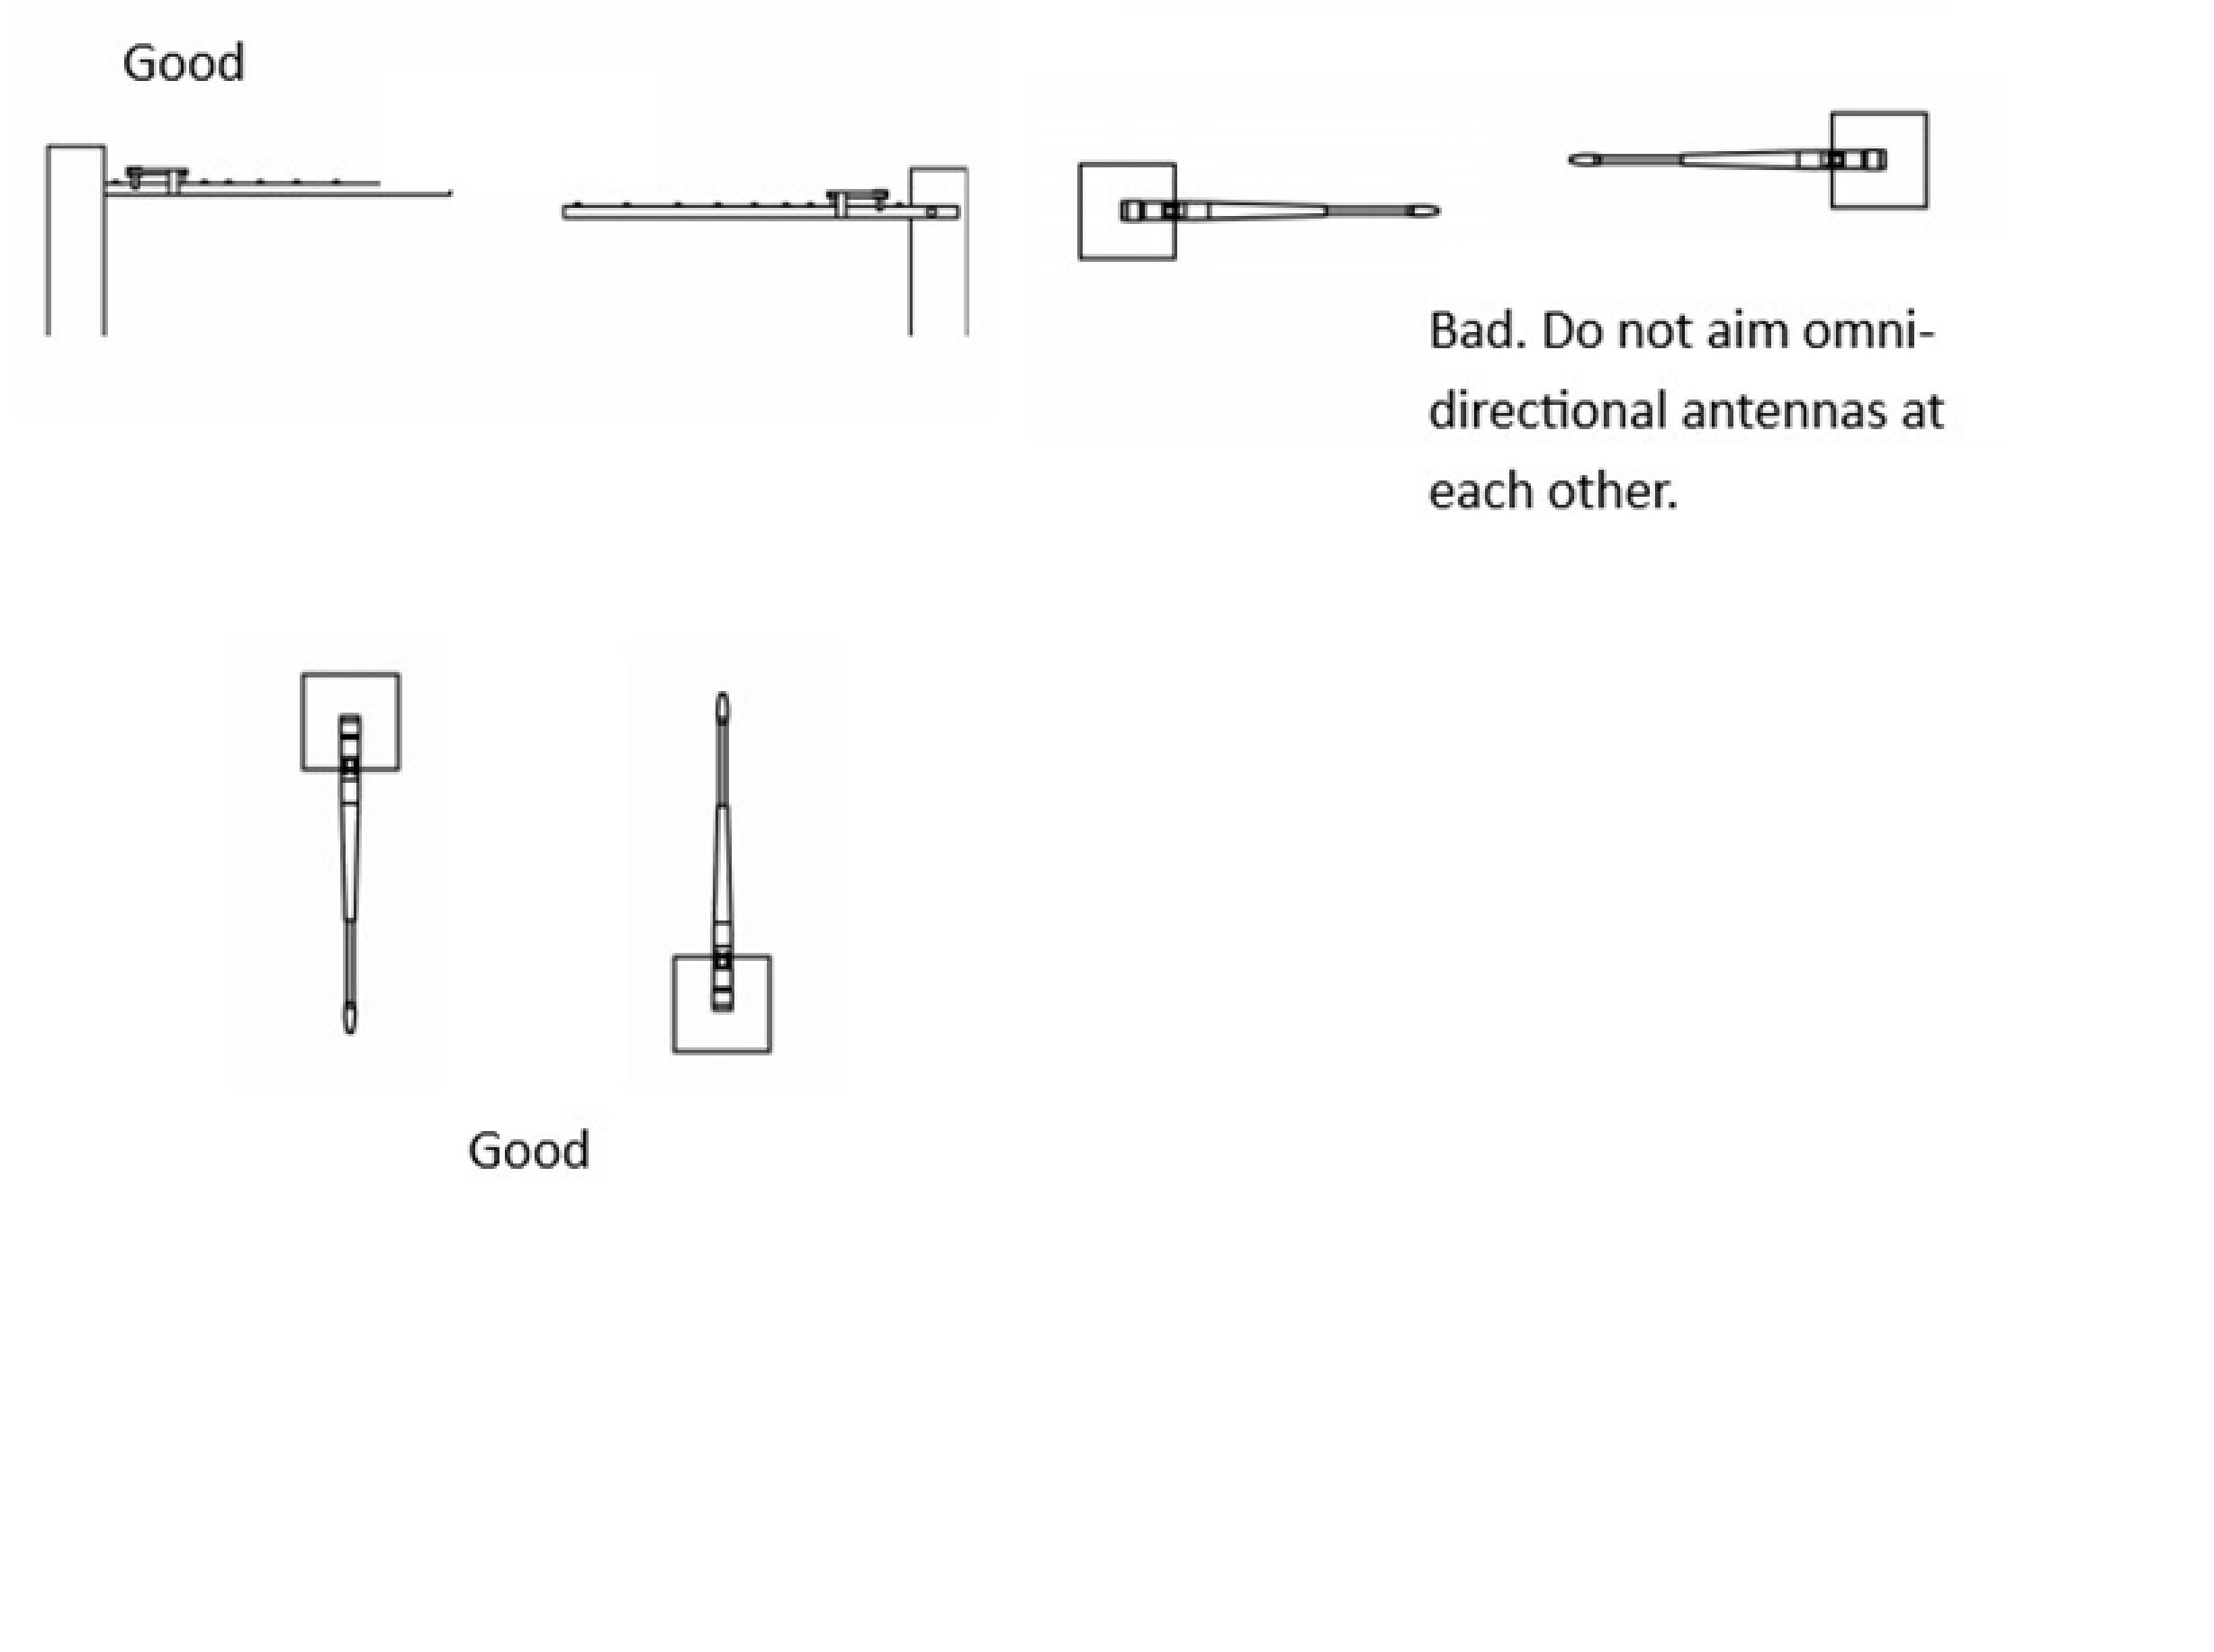 Antenna orentation 2